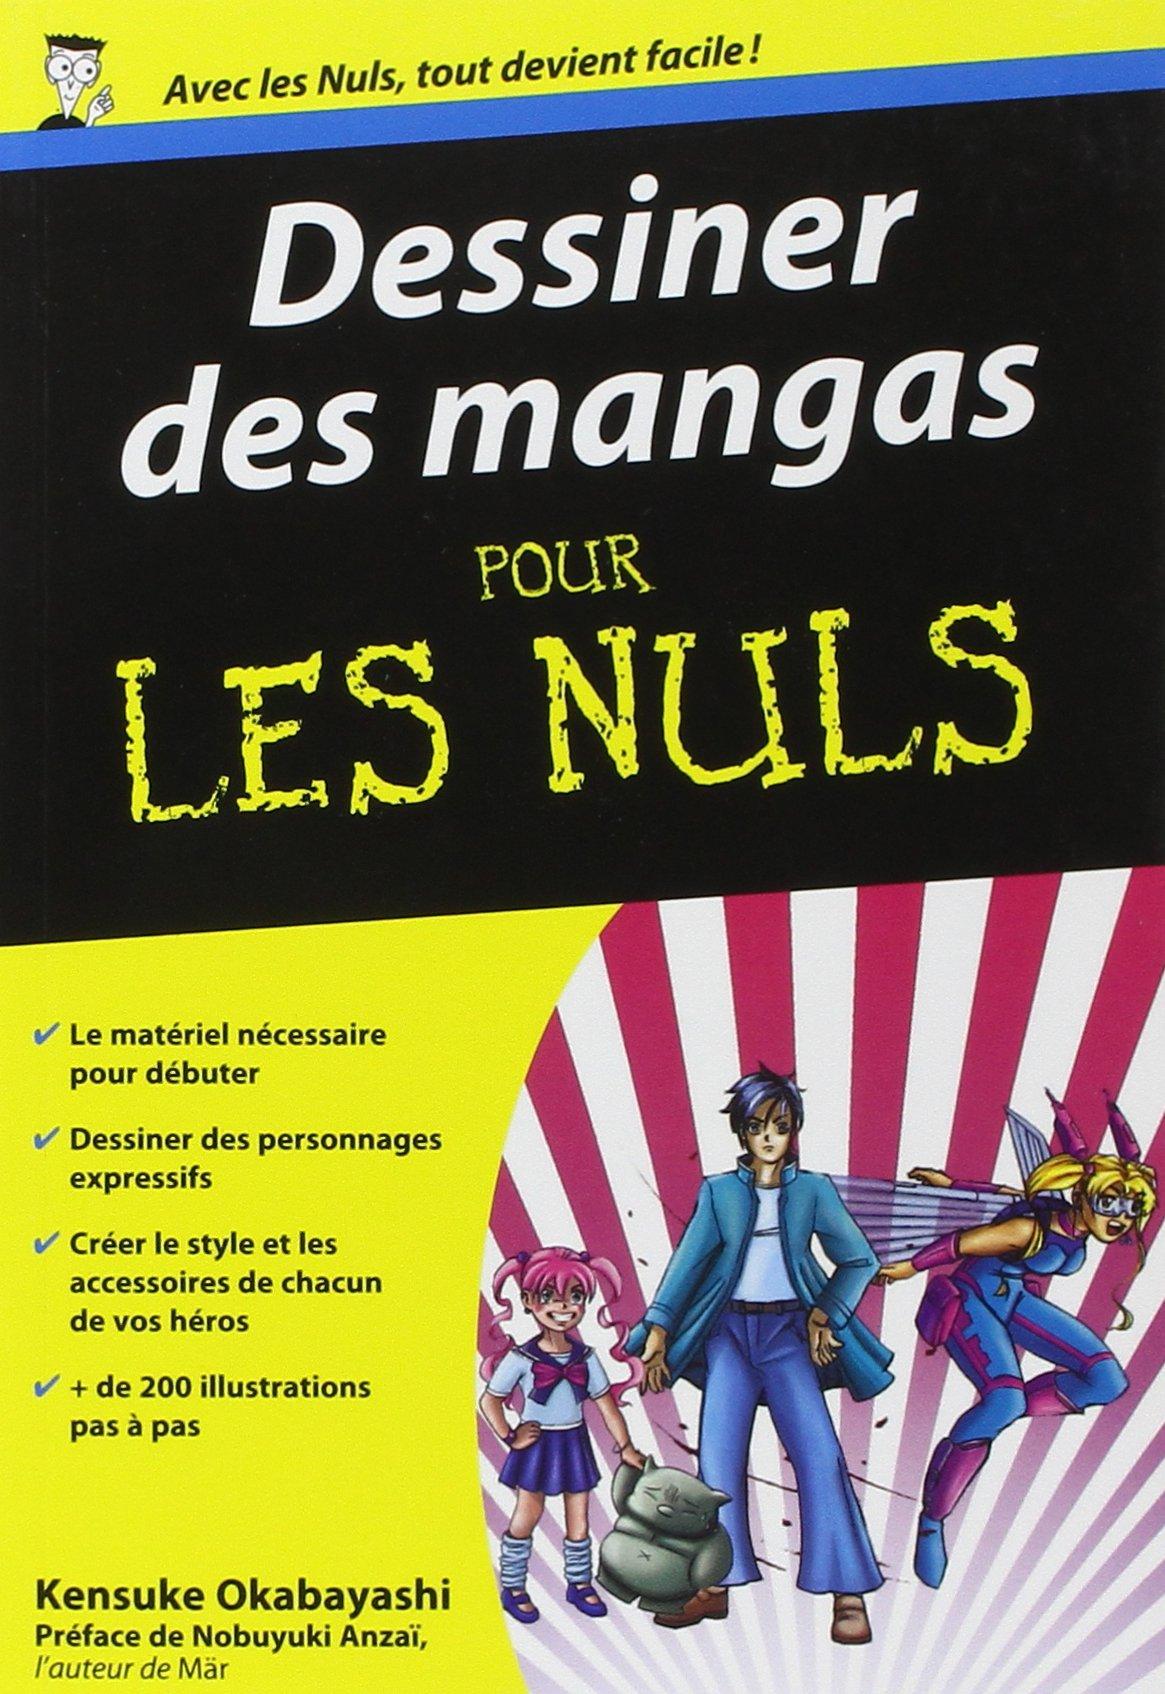 Dessiner des mangas Poche pour les Nuls Broché – 7 avril 2011 Kensuke OKABAYASHI Nobuyuki ANZAI First 2754016015